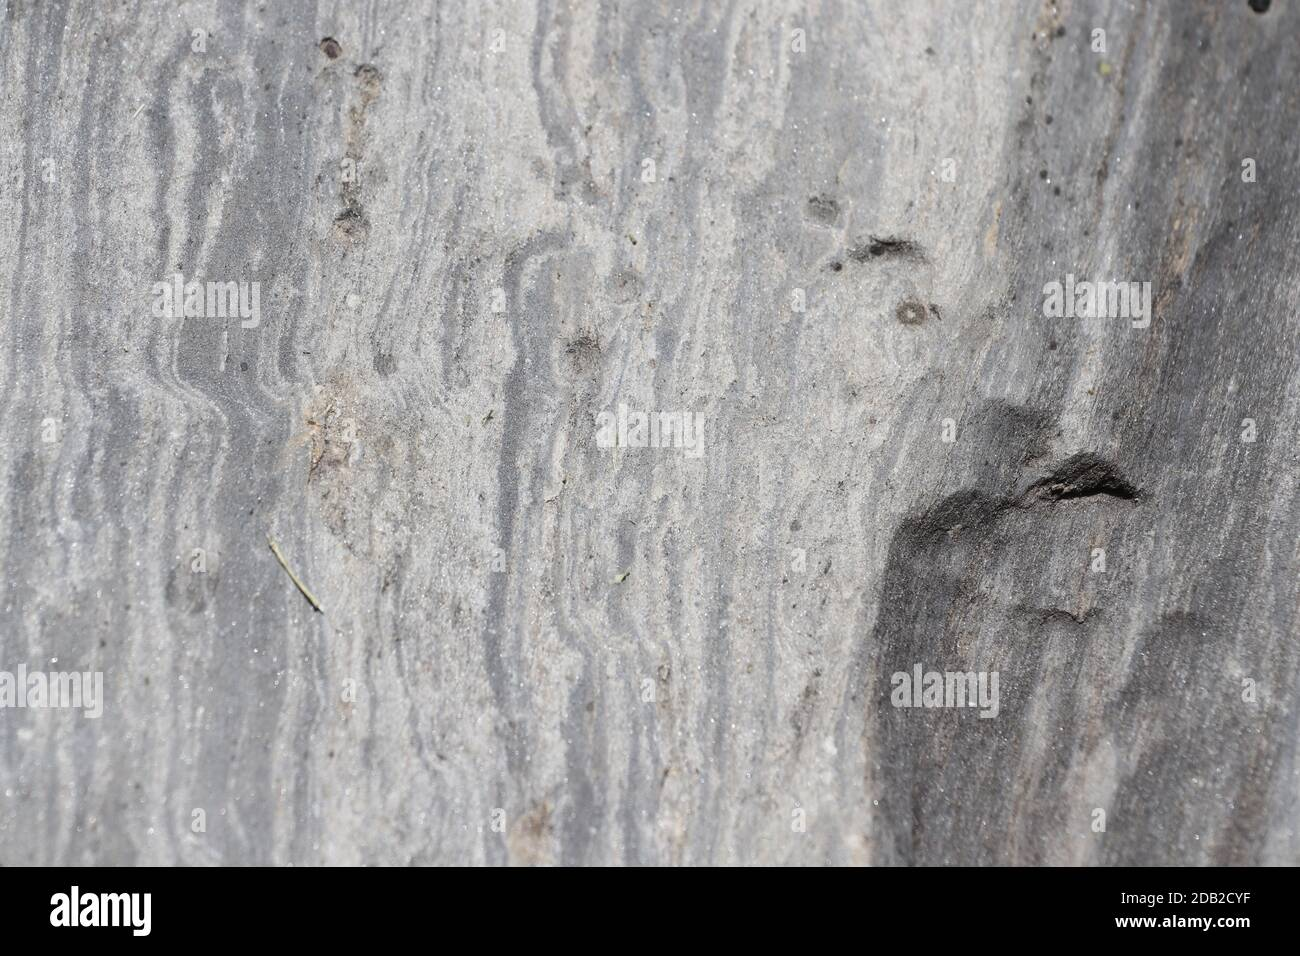 Quatz venas en el rock visto de cerca. Foto de stock